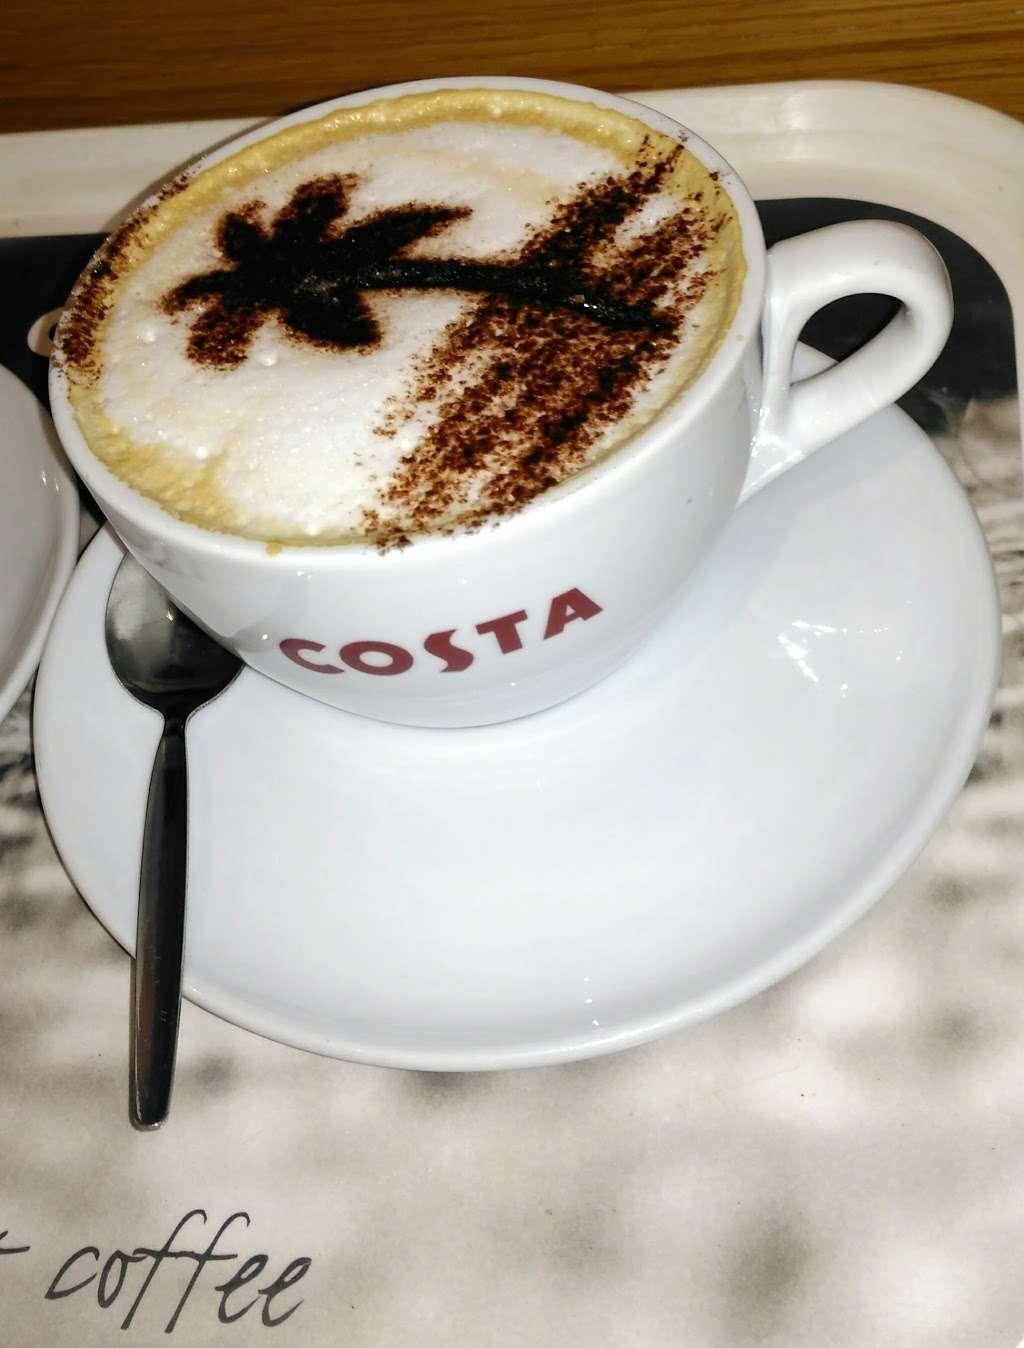 Costa Coffee - cafe    Photo 4 of 10   Address: 8 Warwick Parade, Kenton Ln, Harrow HA3 8SA, UK   Phone: 020 8907 7759